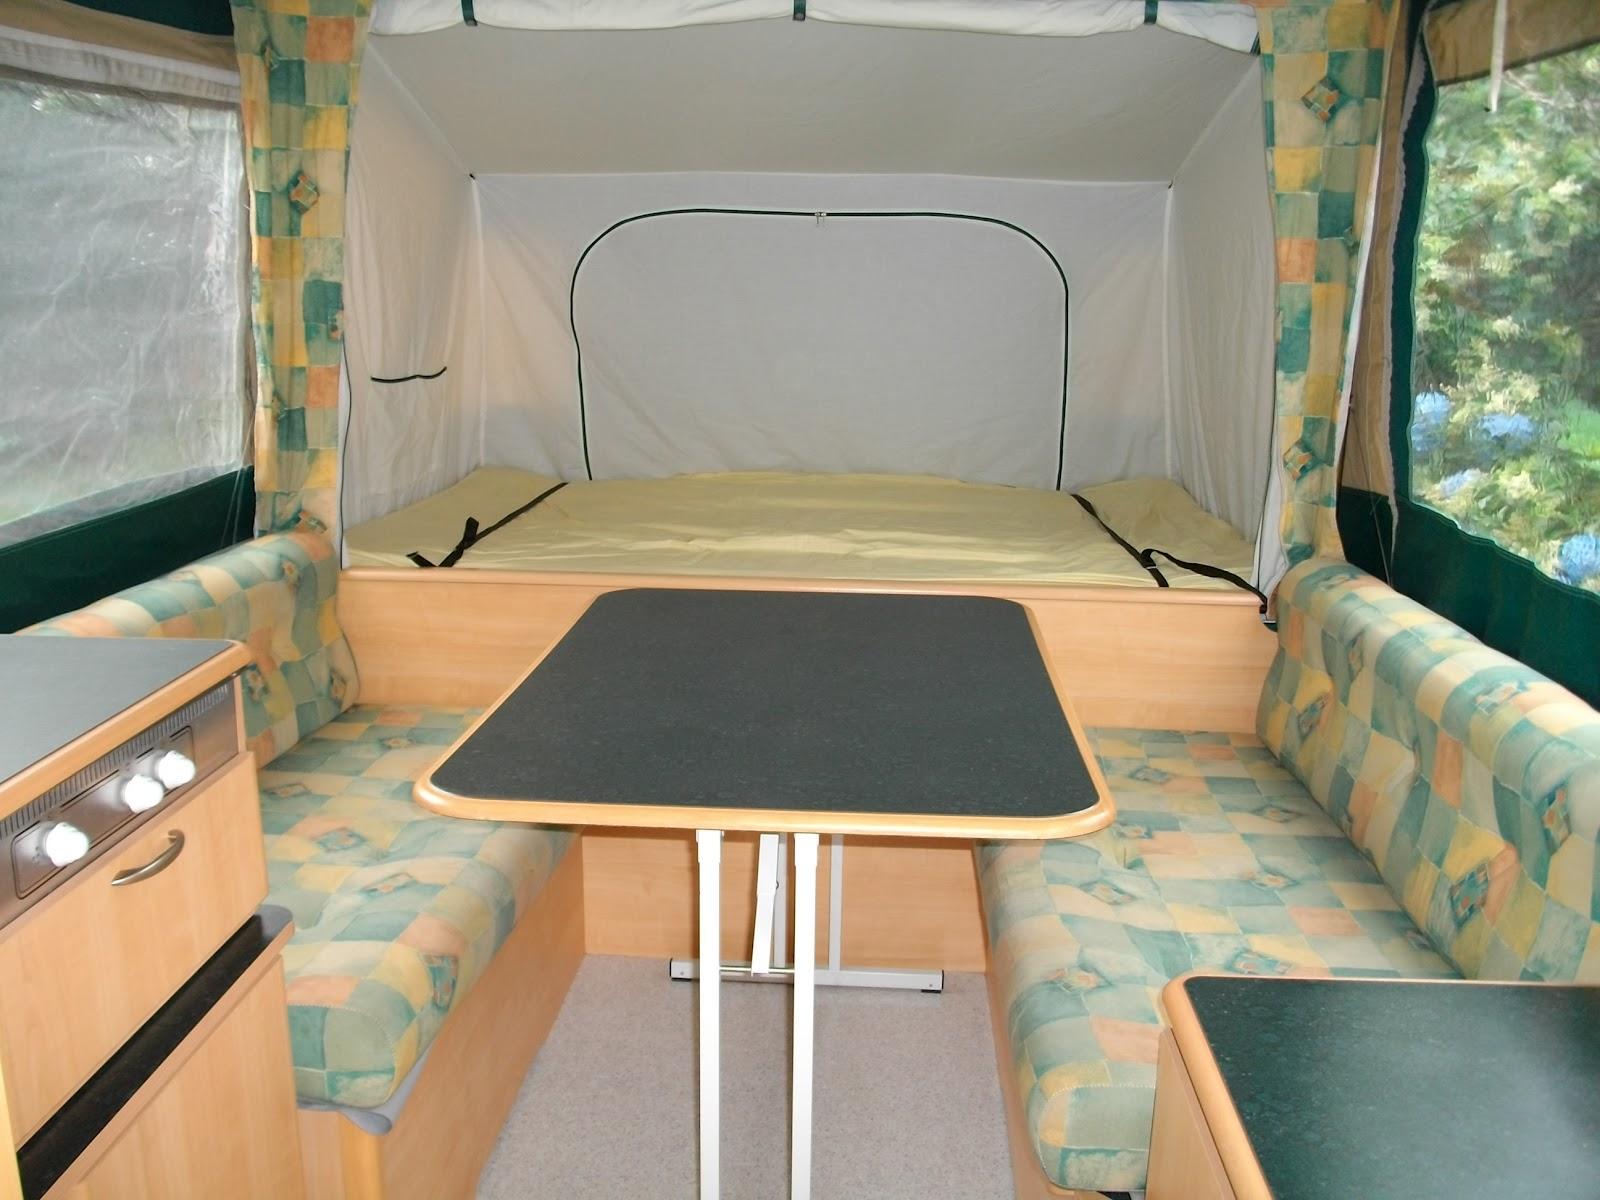 Folding camper for sale trigano randger 575tc latest - Table trigano ...